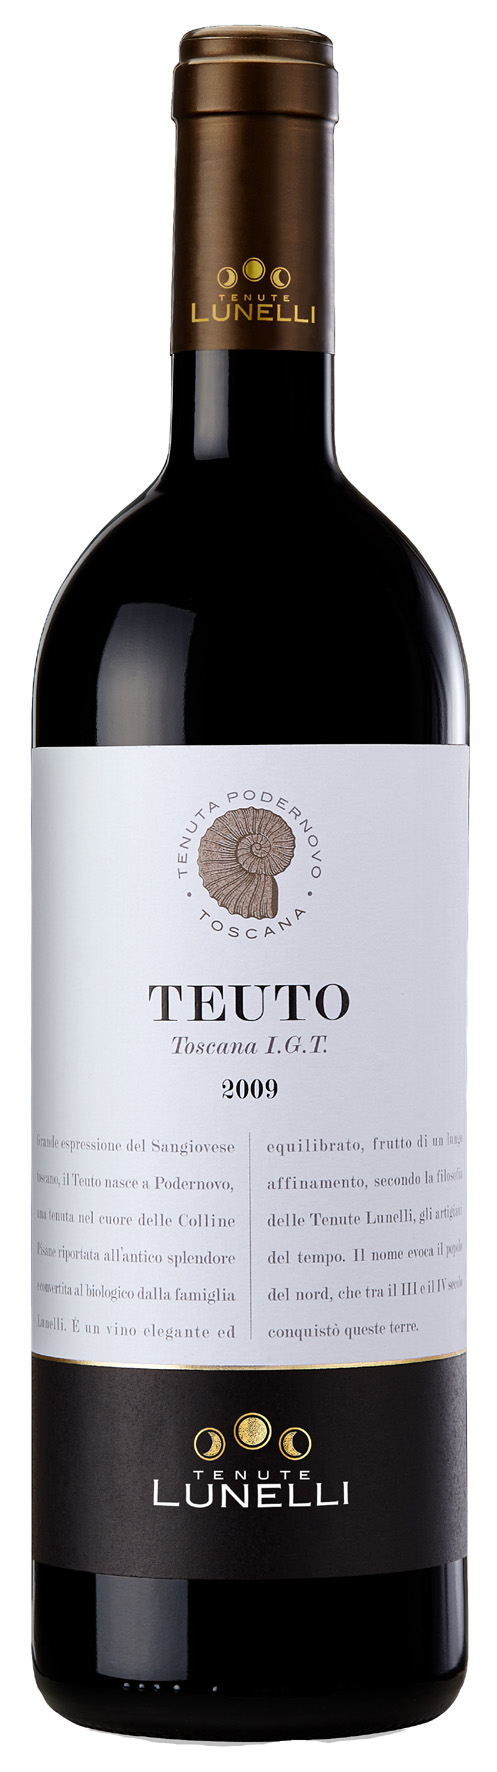 Teuto - Toskana I.G.T. Tenuta Podernovo 2012